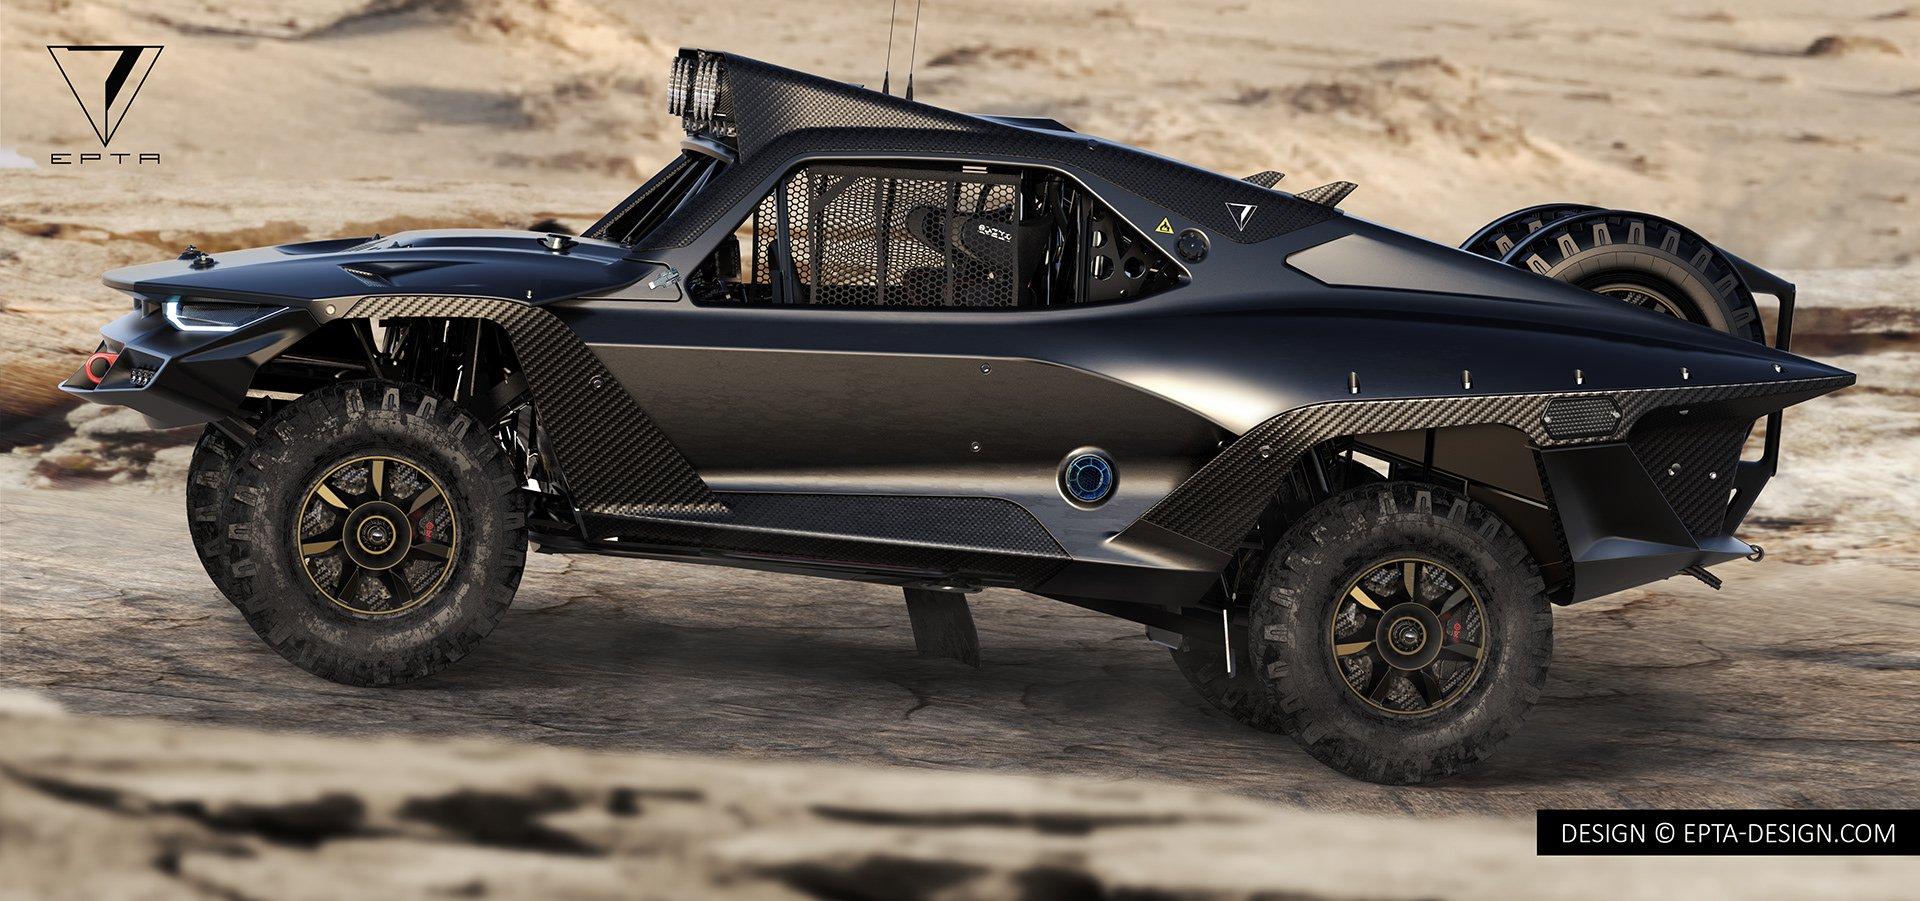 Desert Storm Trophy Truck by EPTA Design (1)